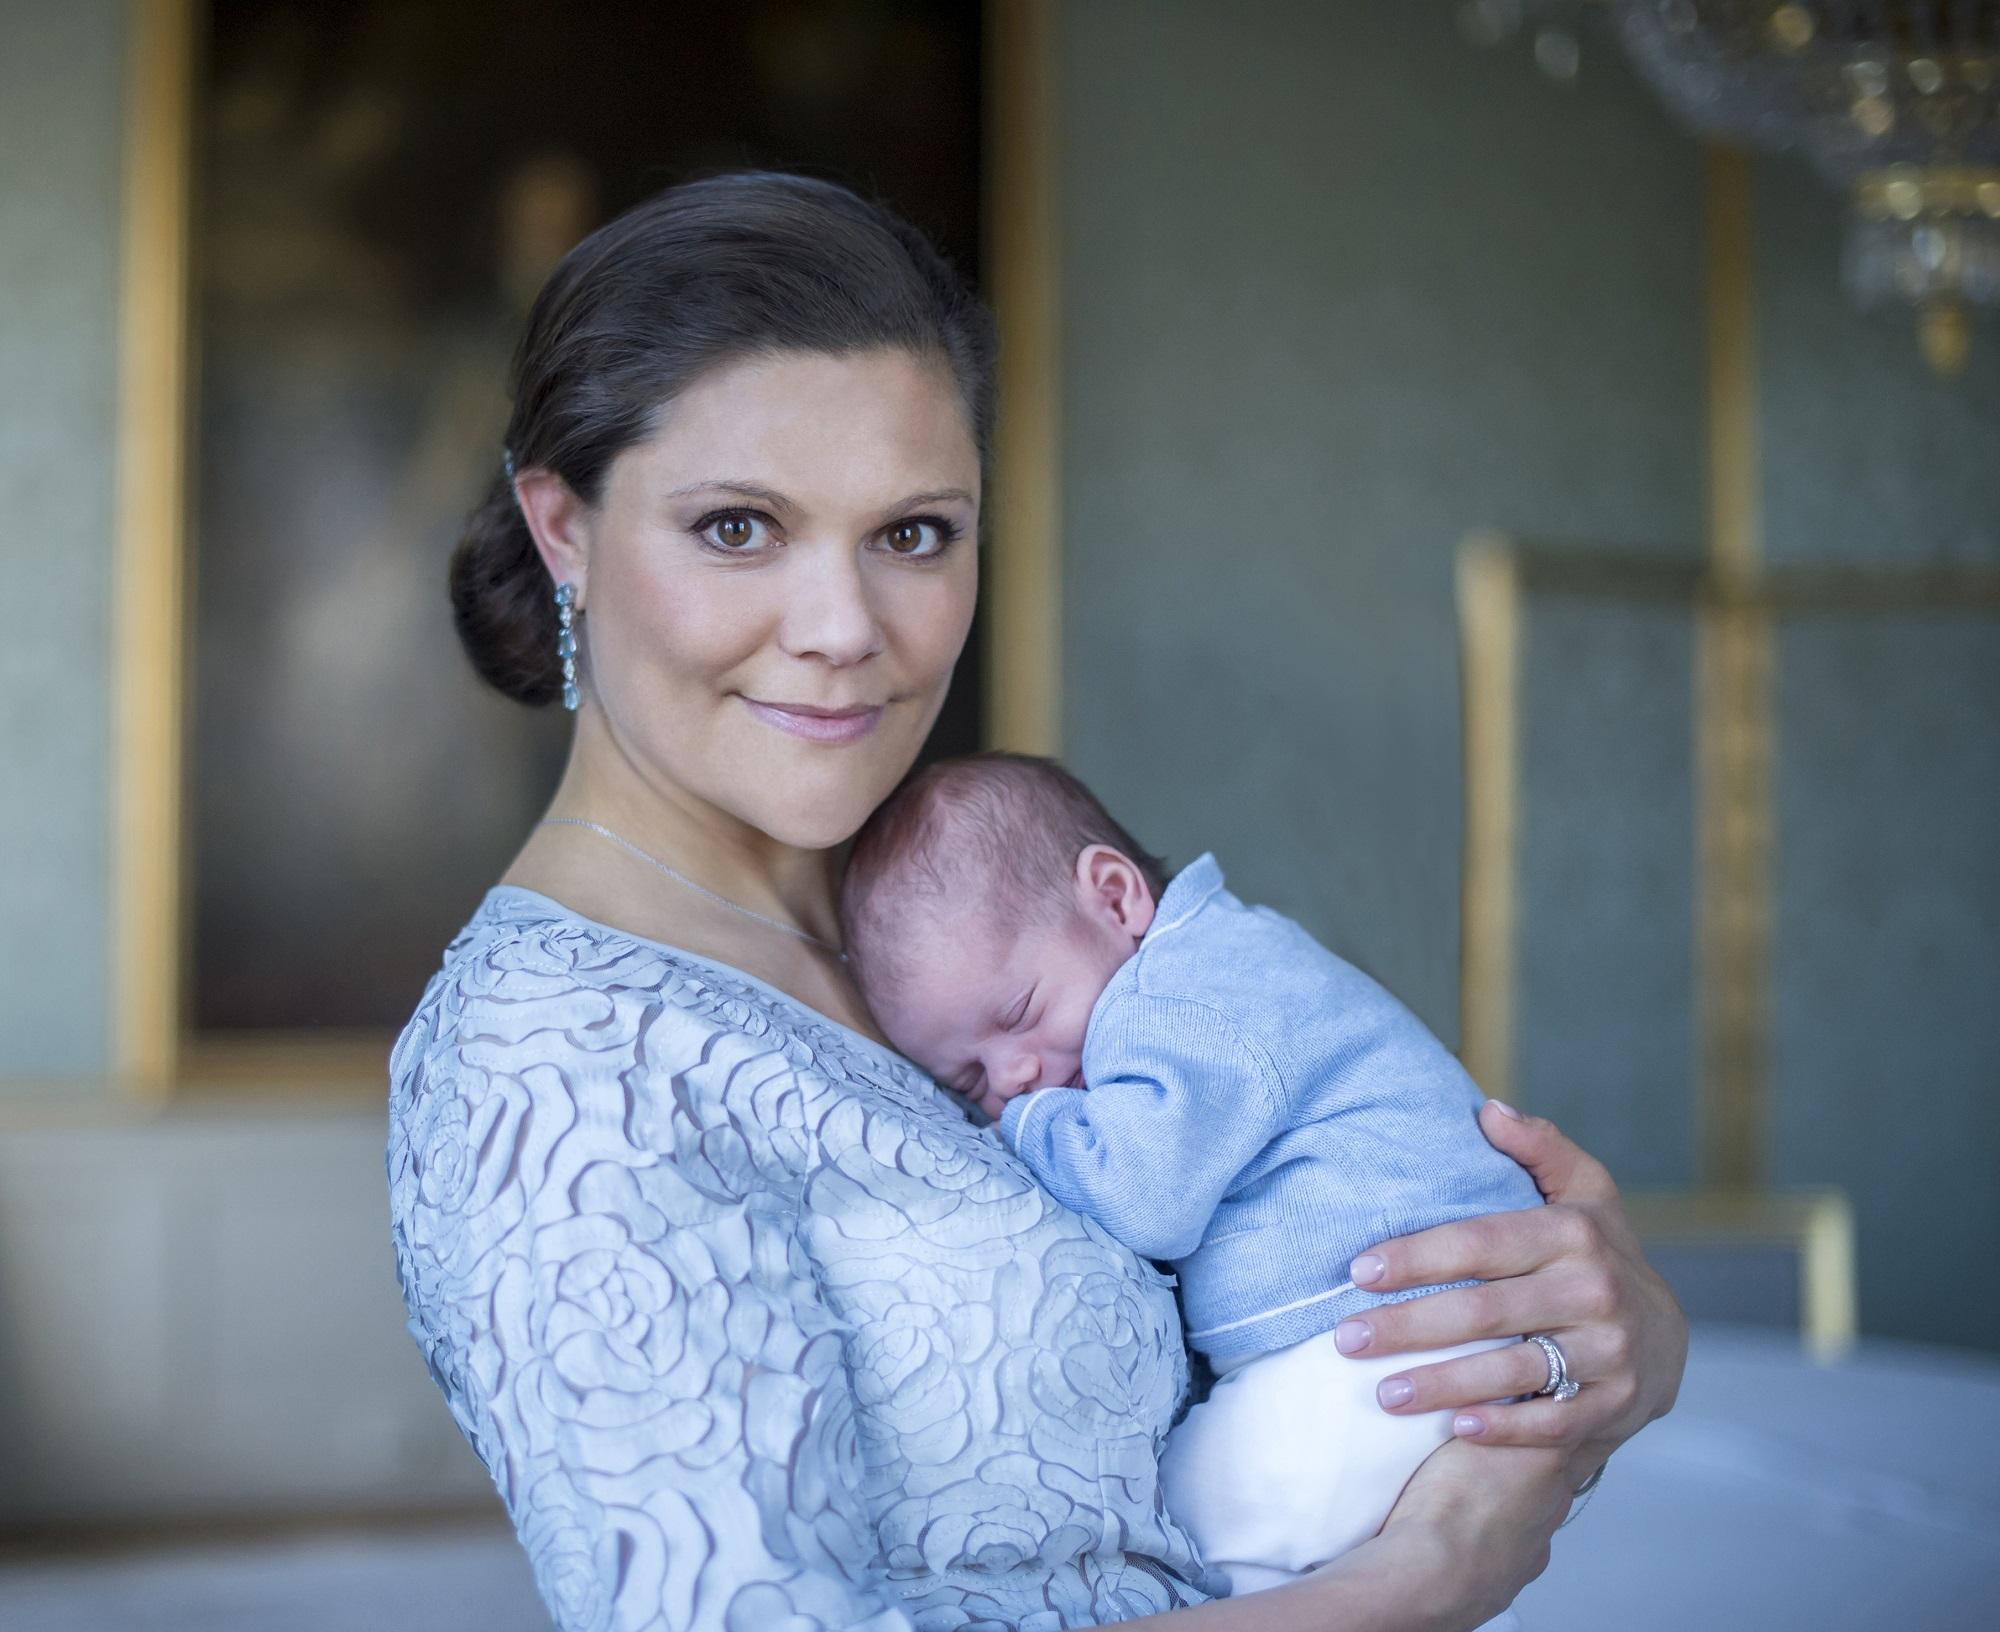 Principessa Victoria di Svezia, Principe Oscar